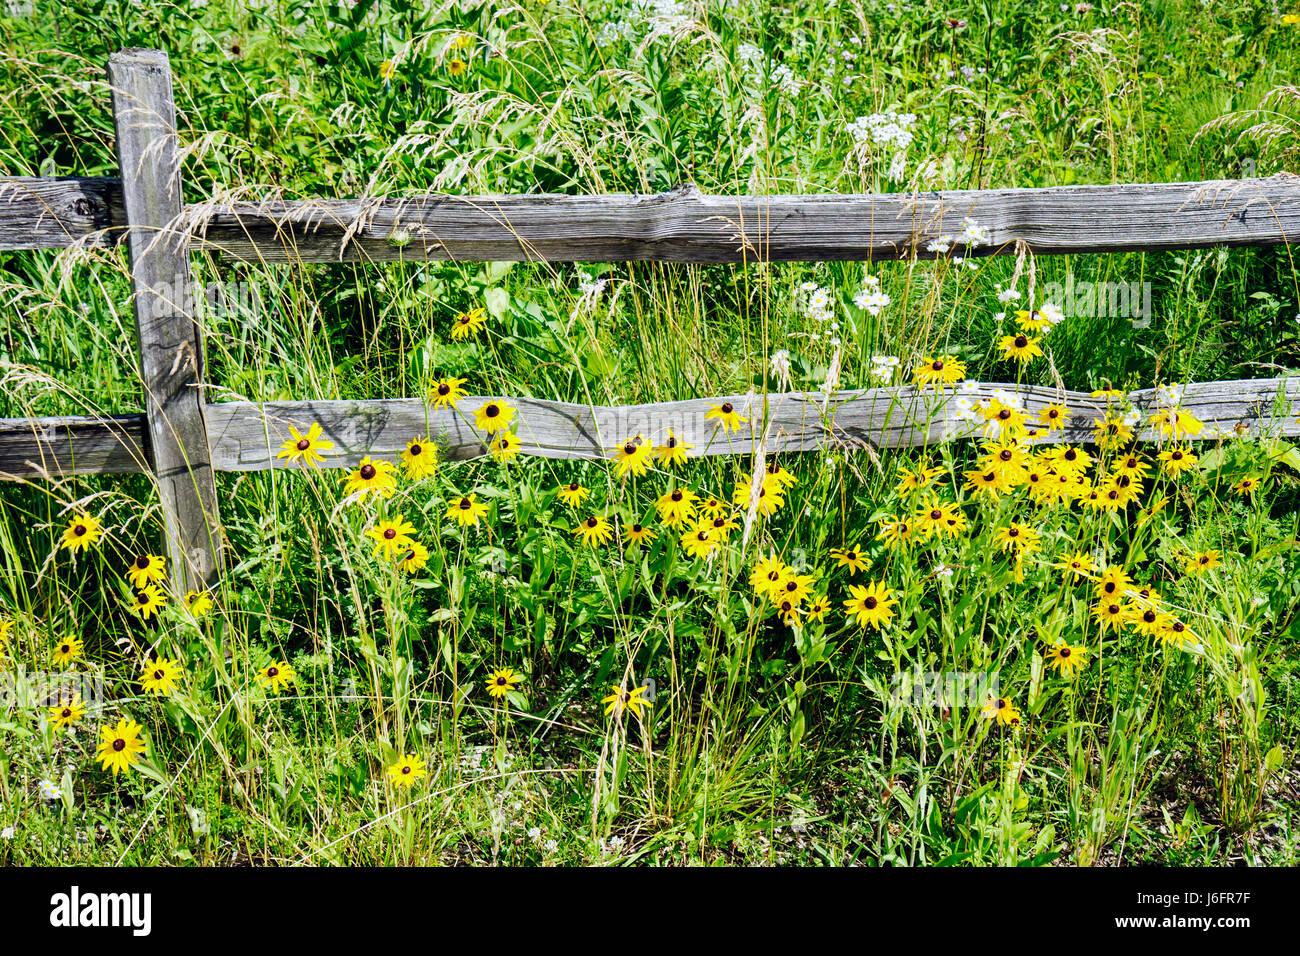 Wisconsin Kenosha Kansasville Richard Bong State Recreation Area prairie flowers yellow park vegetation wood fence - Stock Image